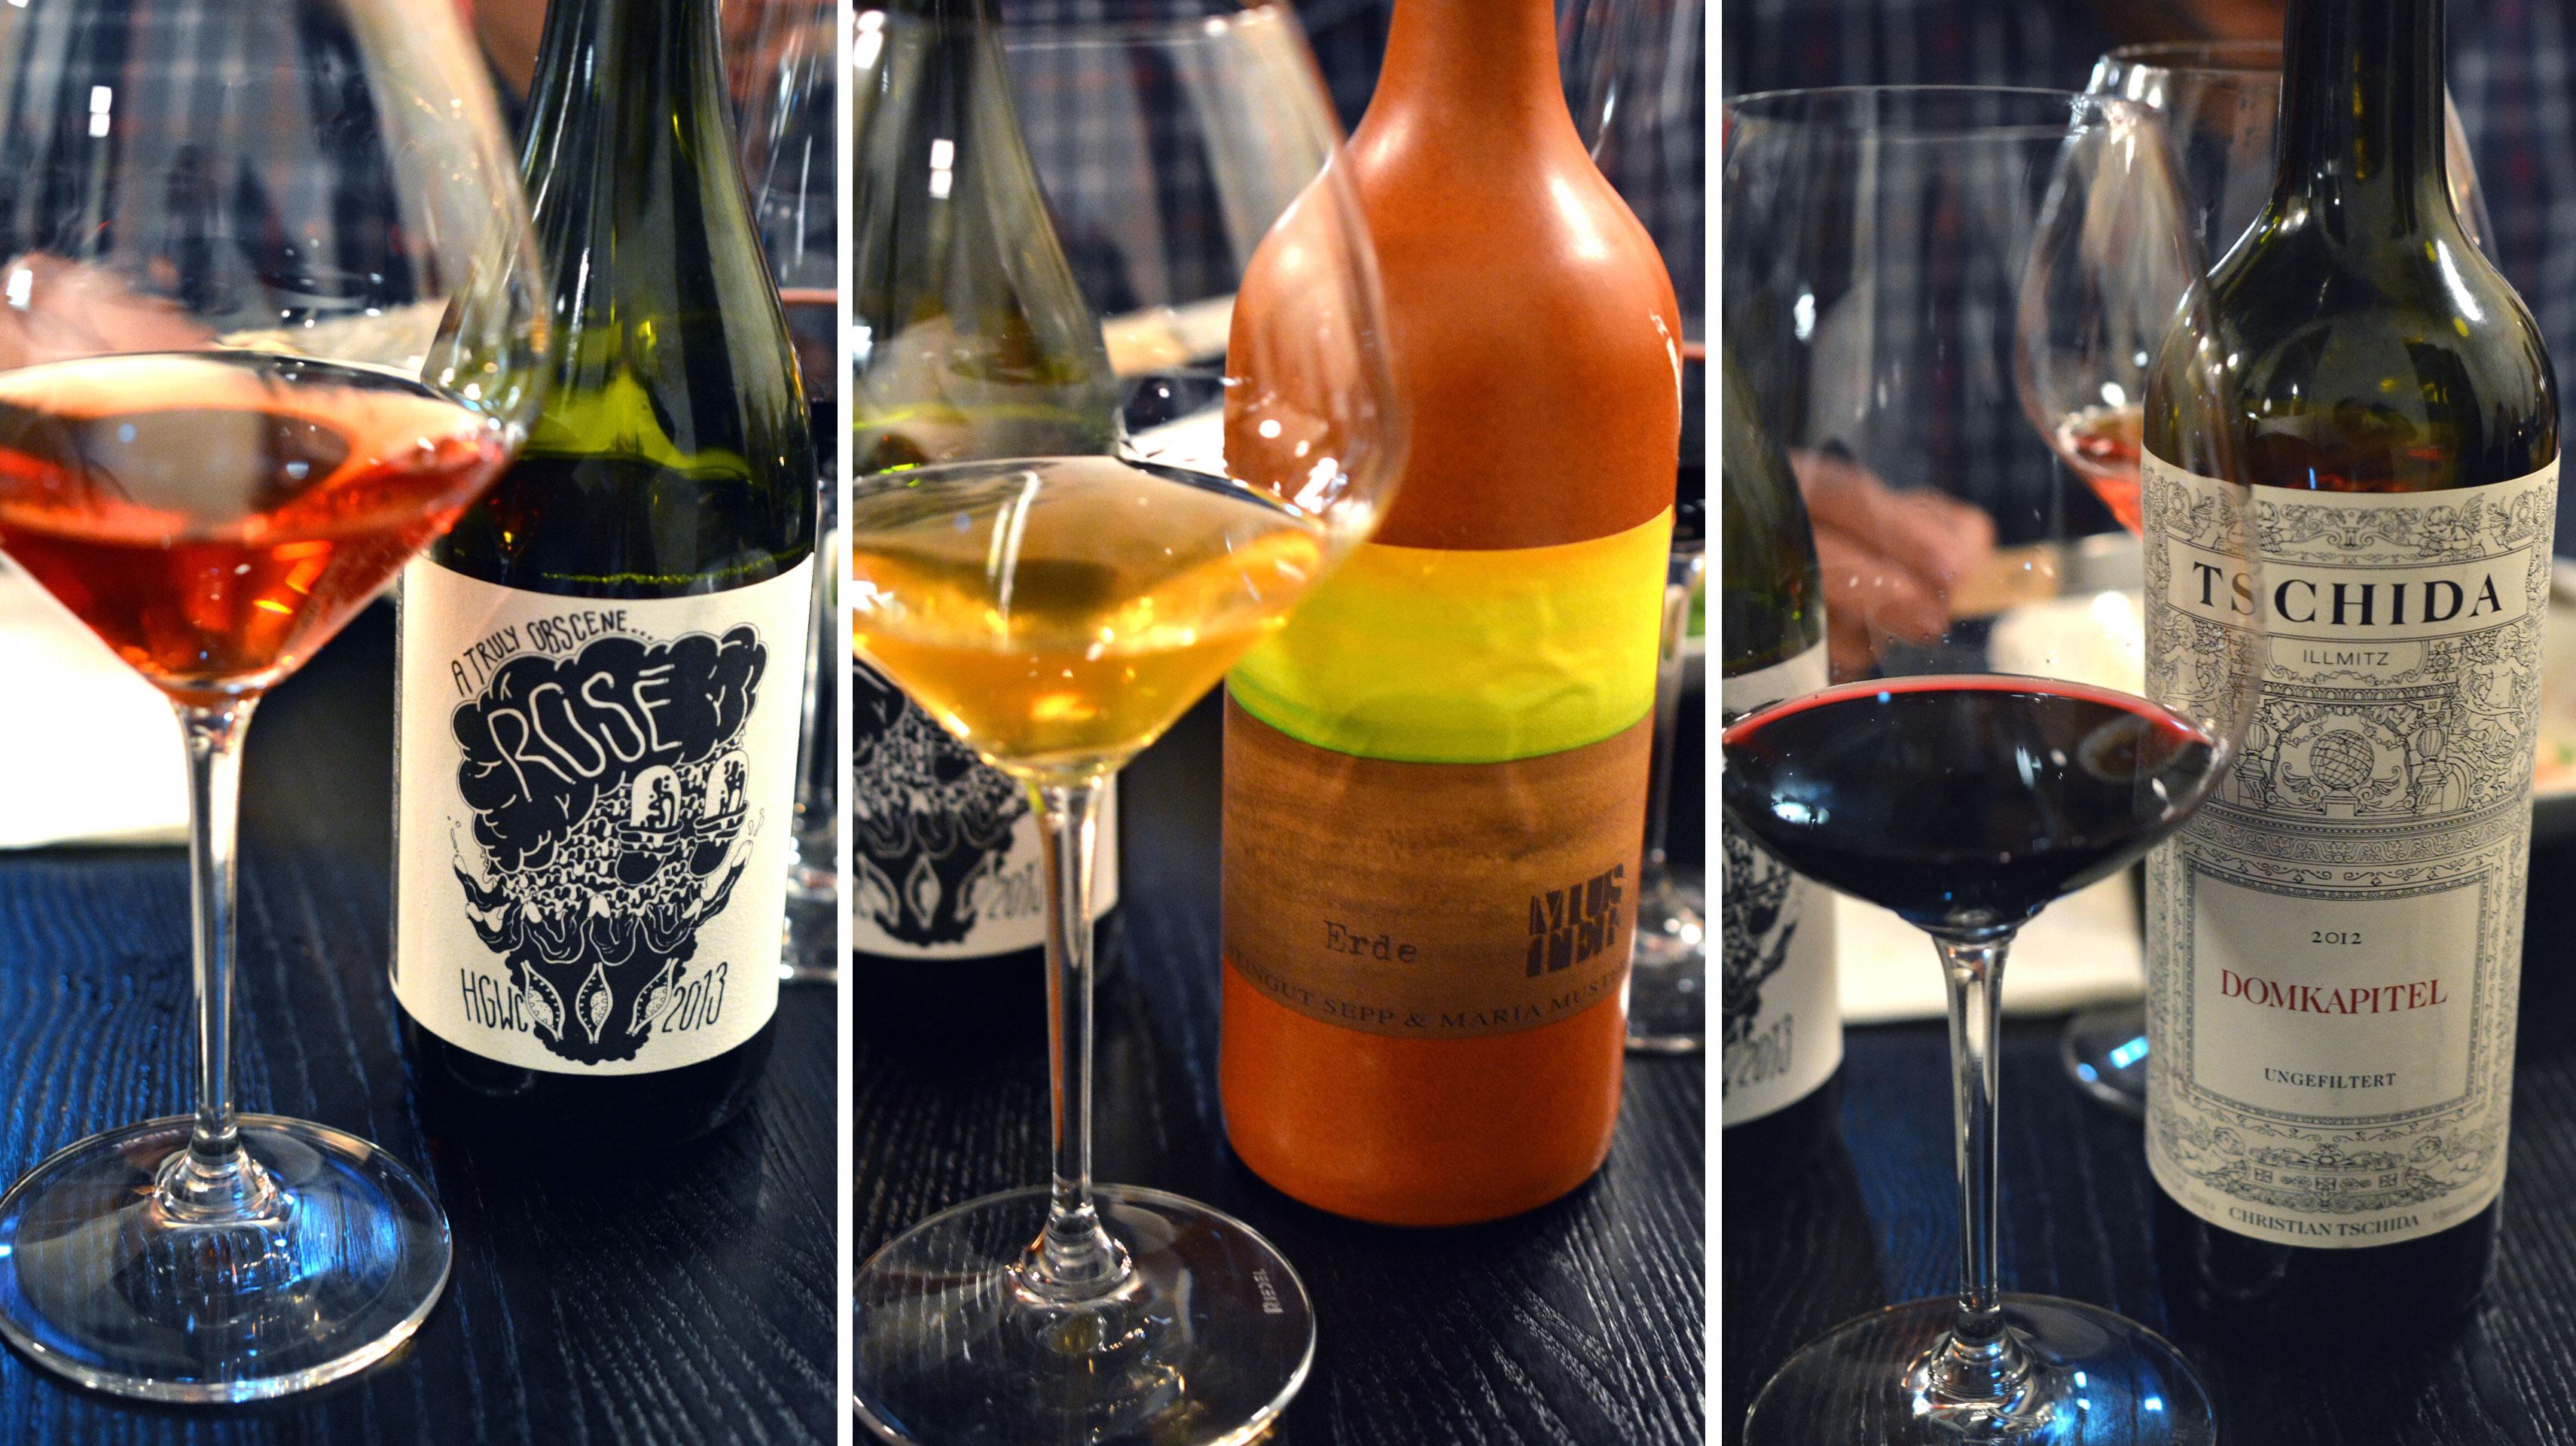 HGWC Rosé, Weingut Sepp & Maria Muster Erde, Christian Tschida Domkapitel